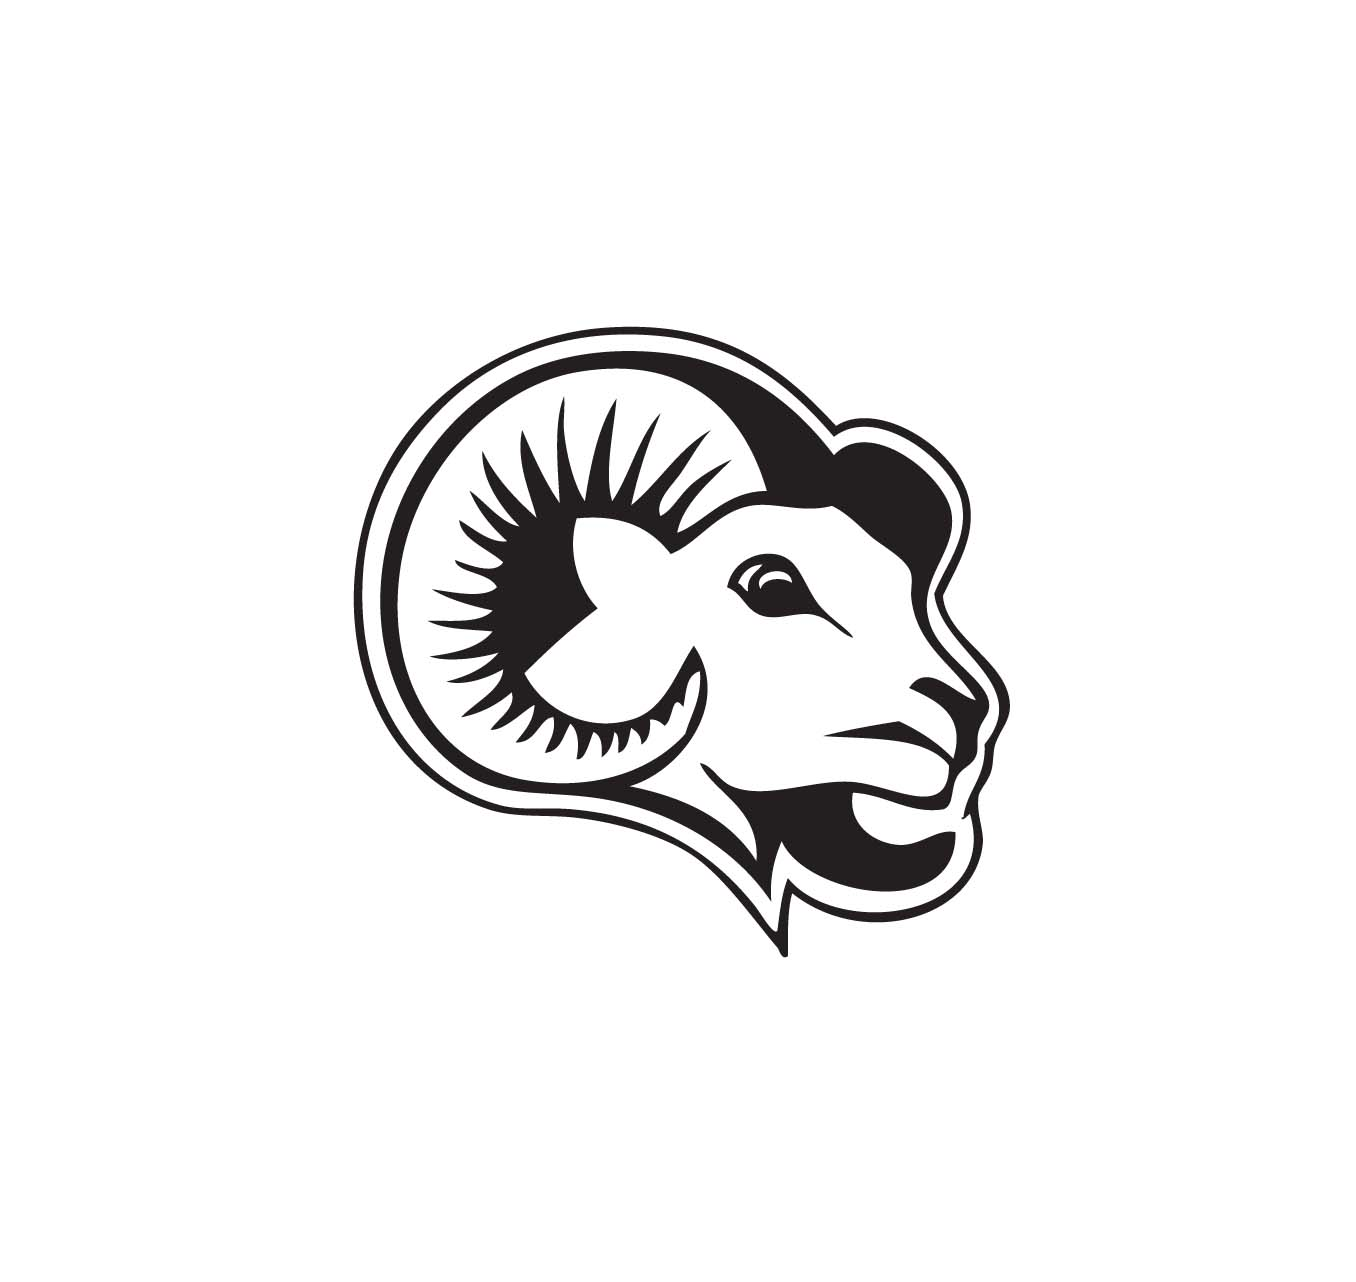 Ram Mascot Clipart